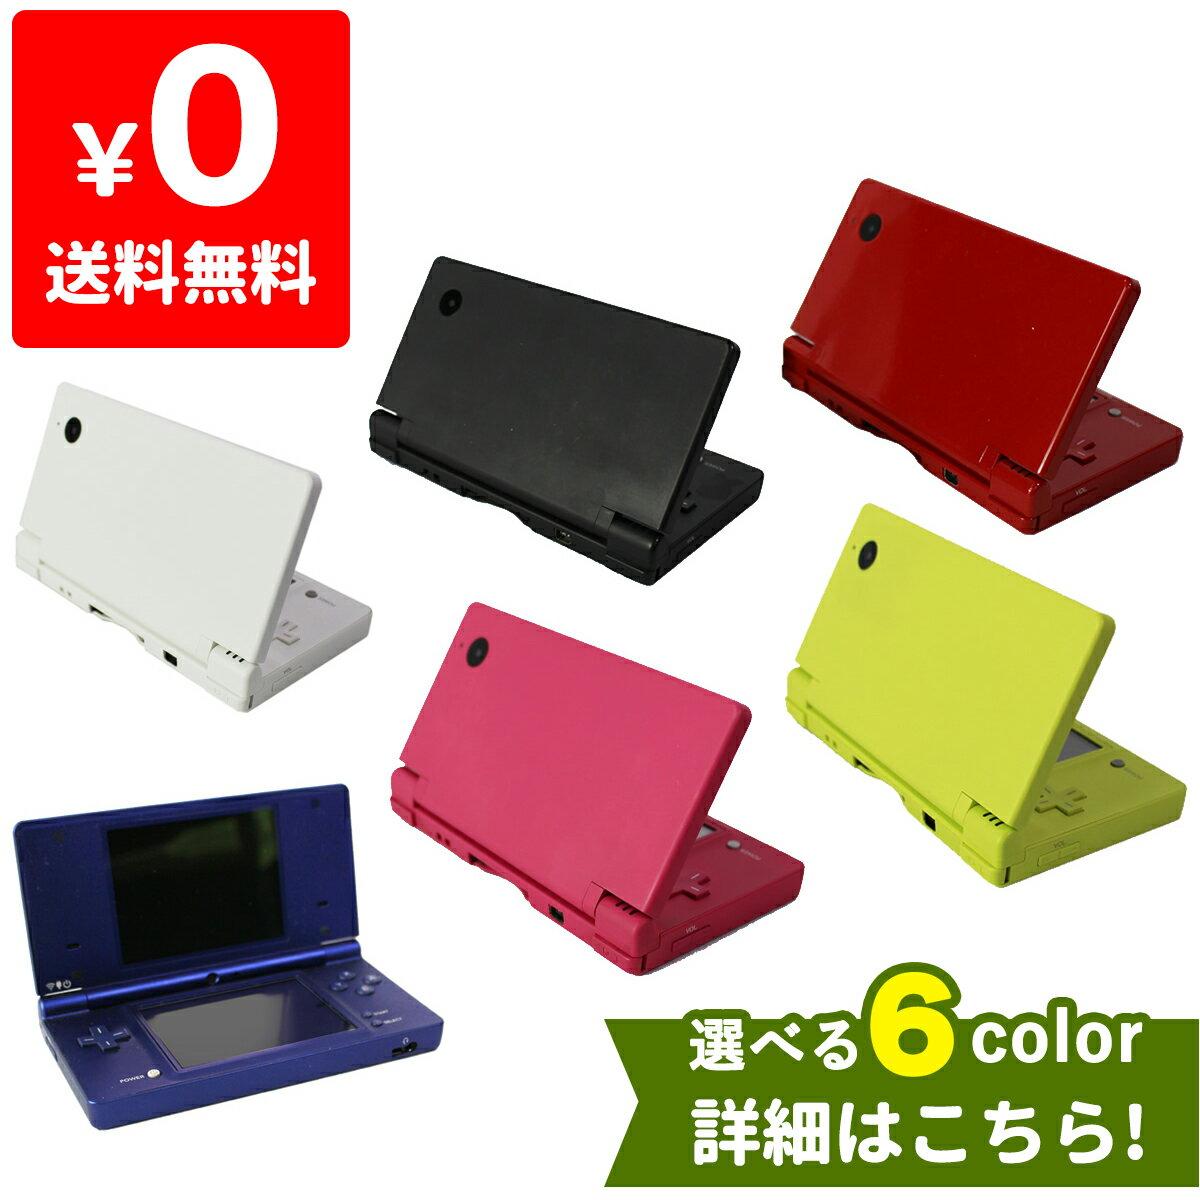 DSi ニンテンドーDSi 本体 タッチペン付 選べる6色 任天堂 【中古】 4902370517170 送料無料